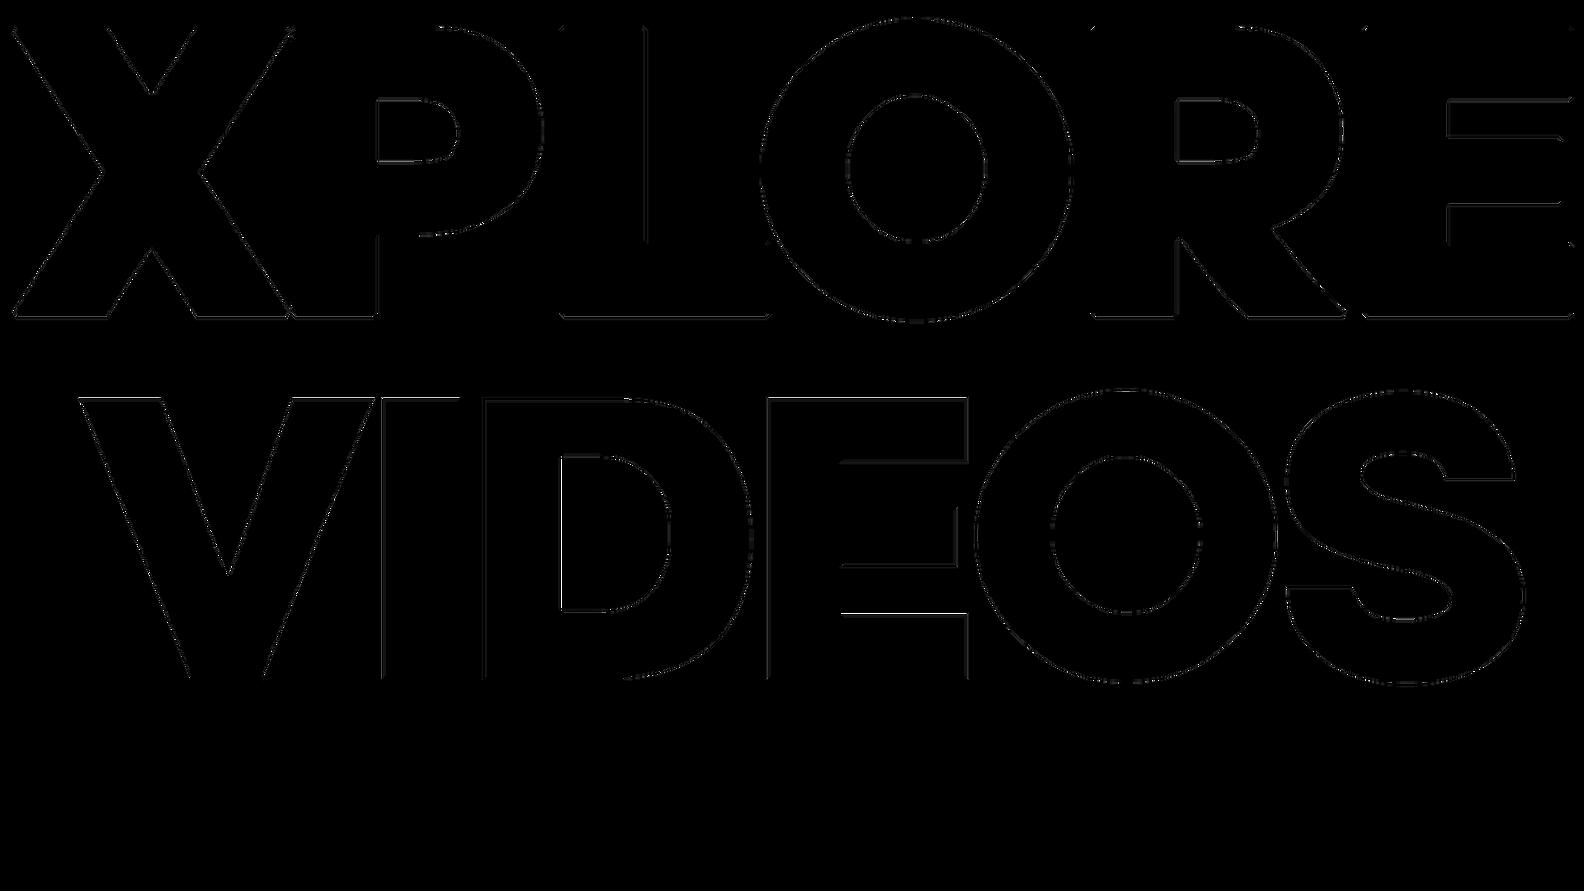 Provicali Font 2 - CLOSER - BLACK.png